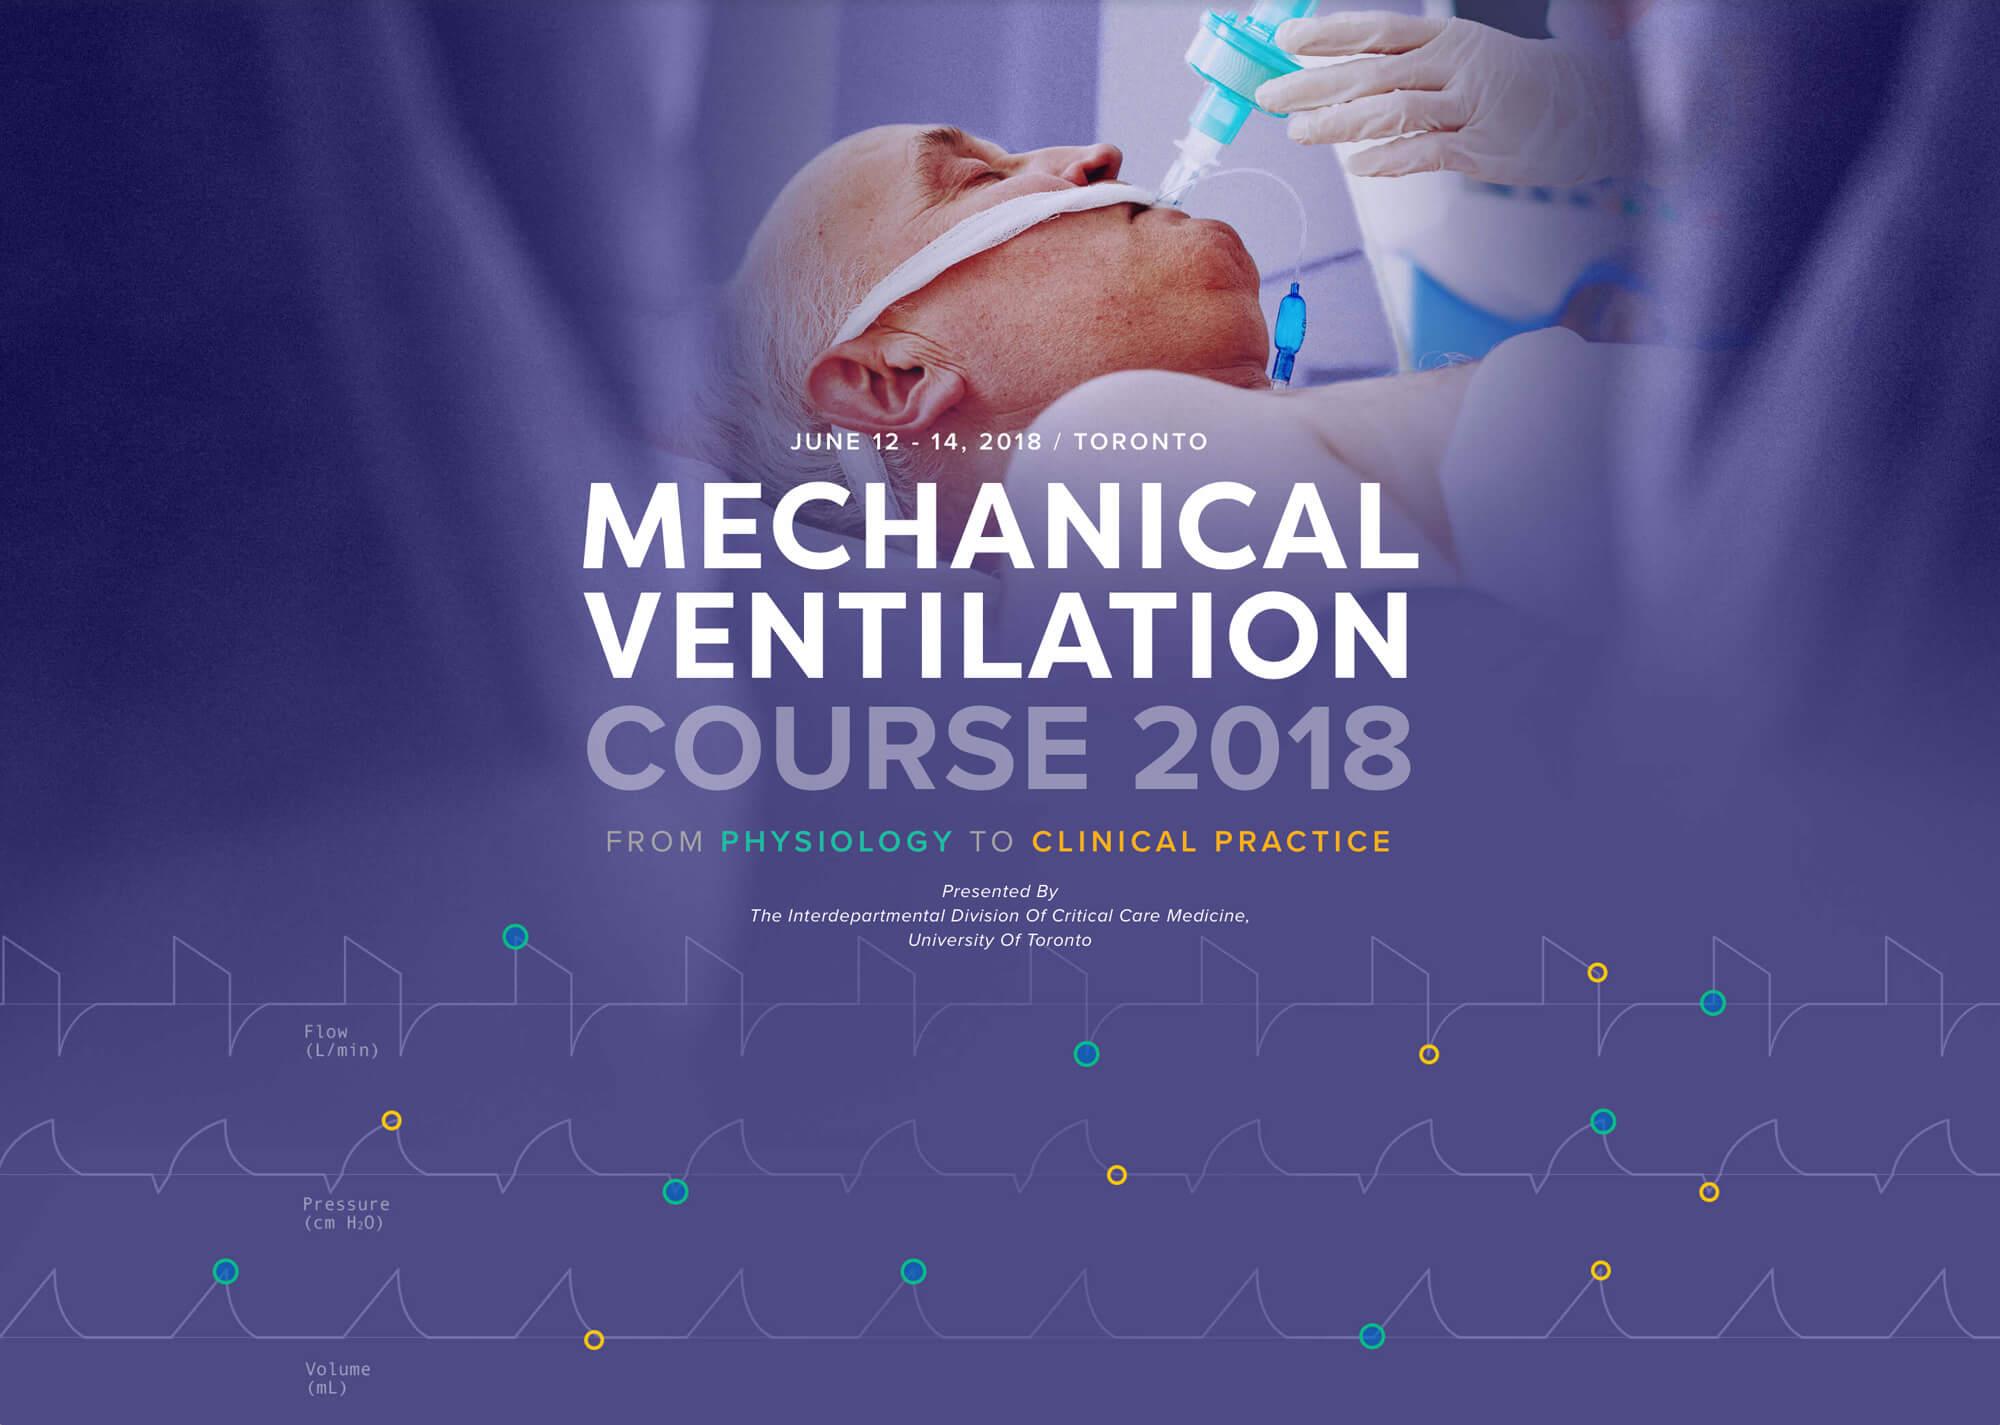 Mechanical Ventilation Symposium